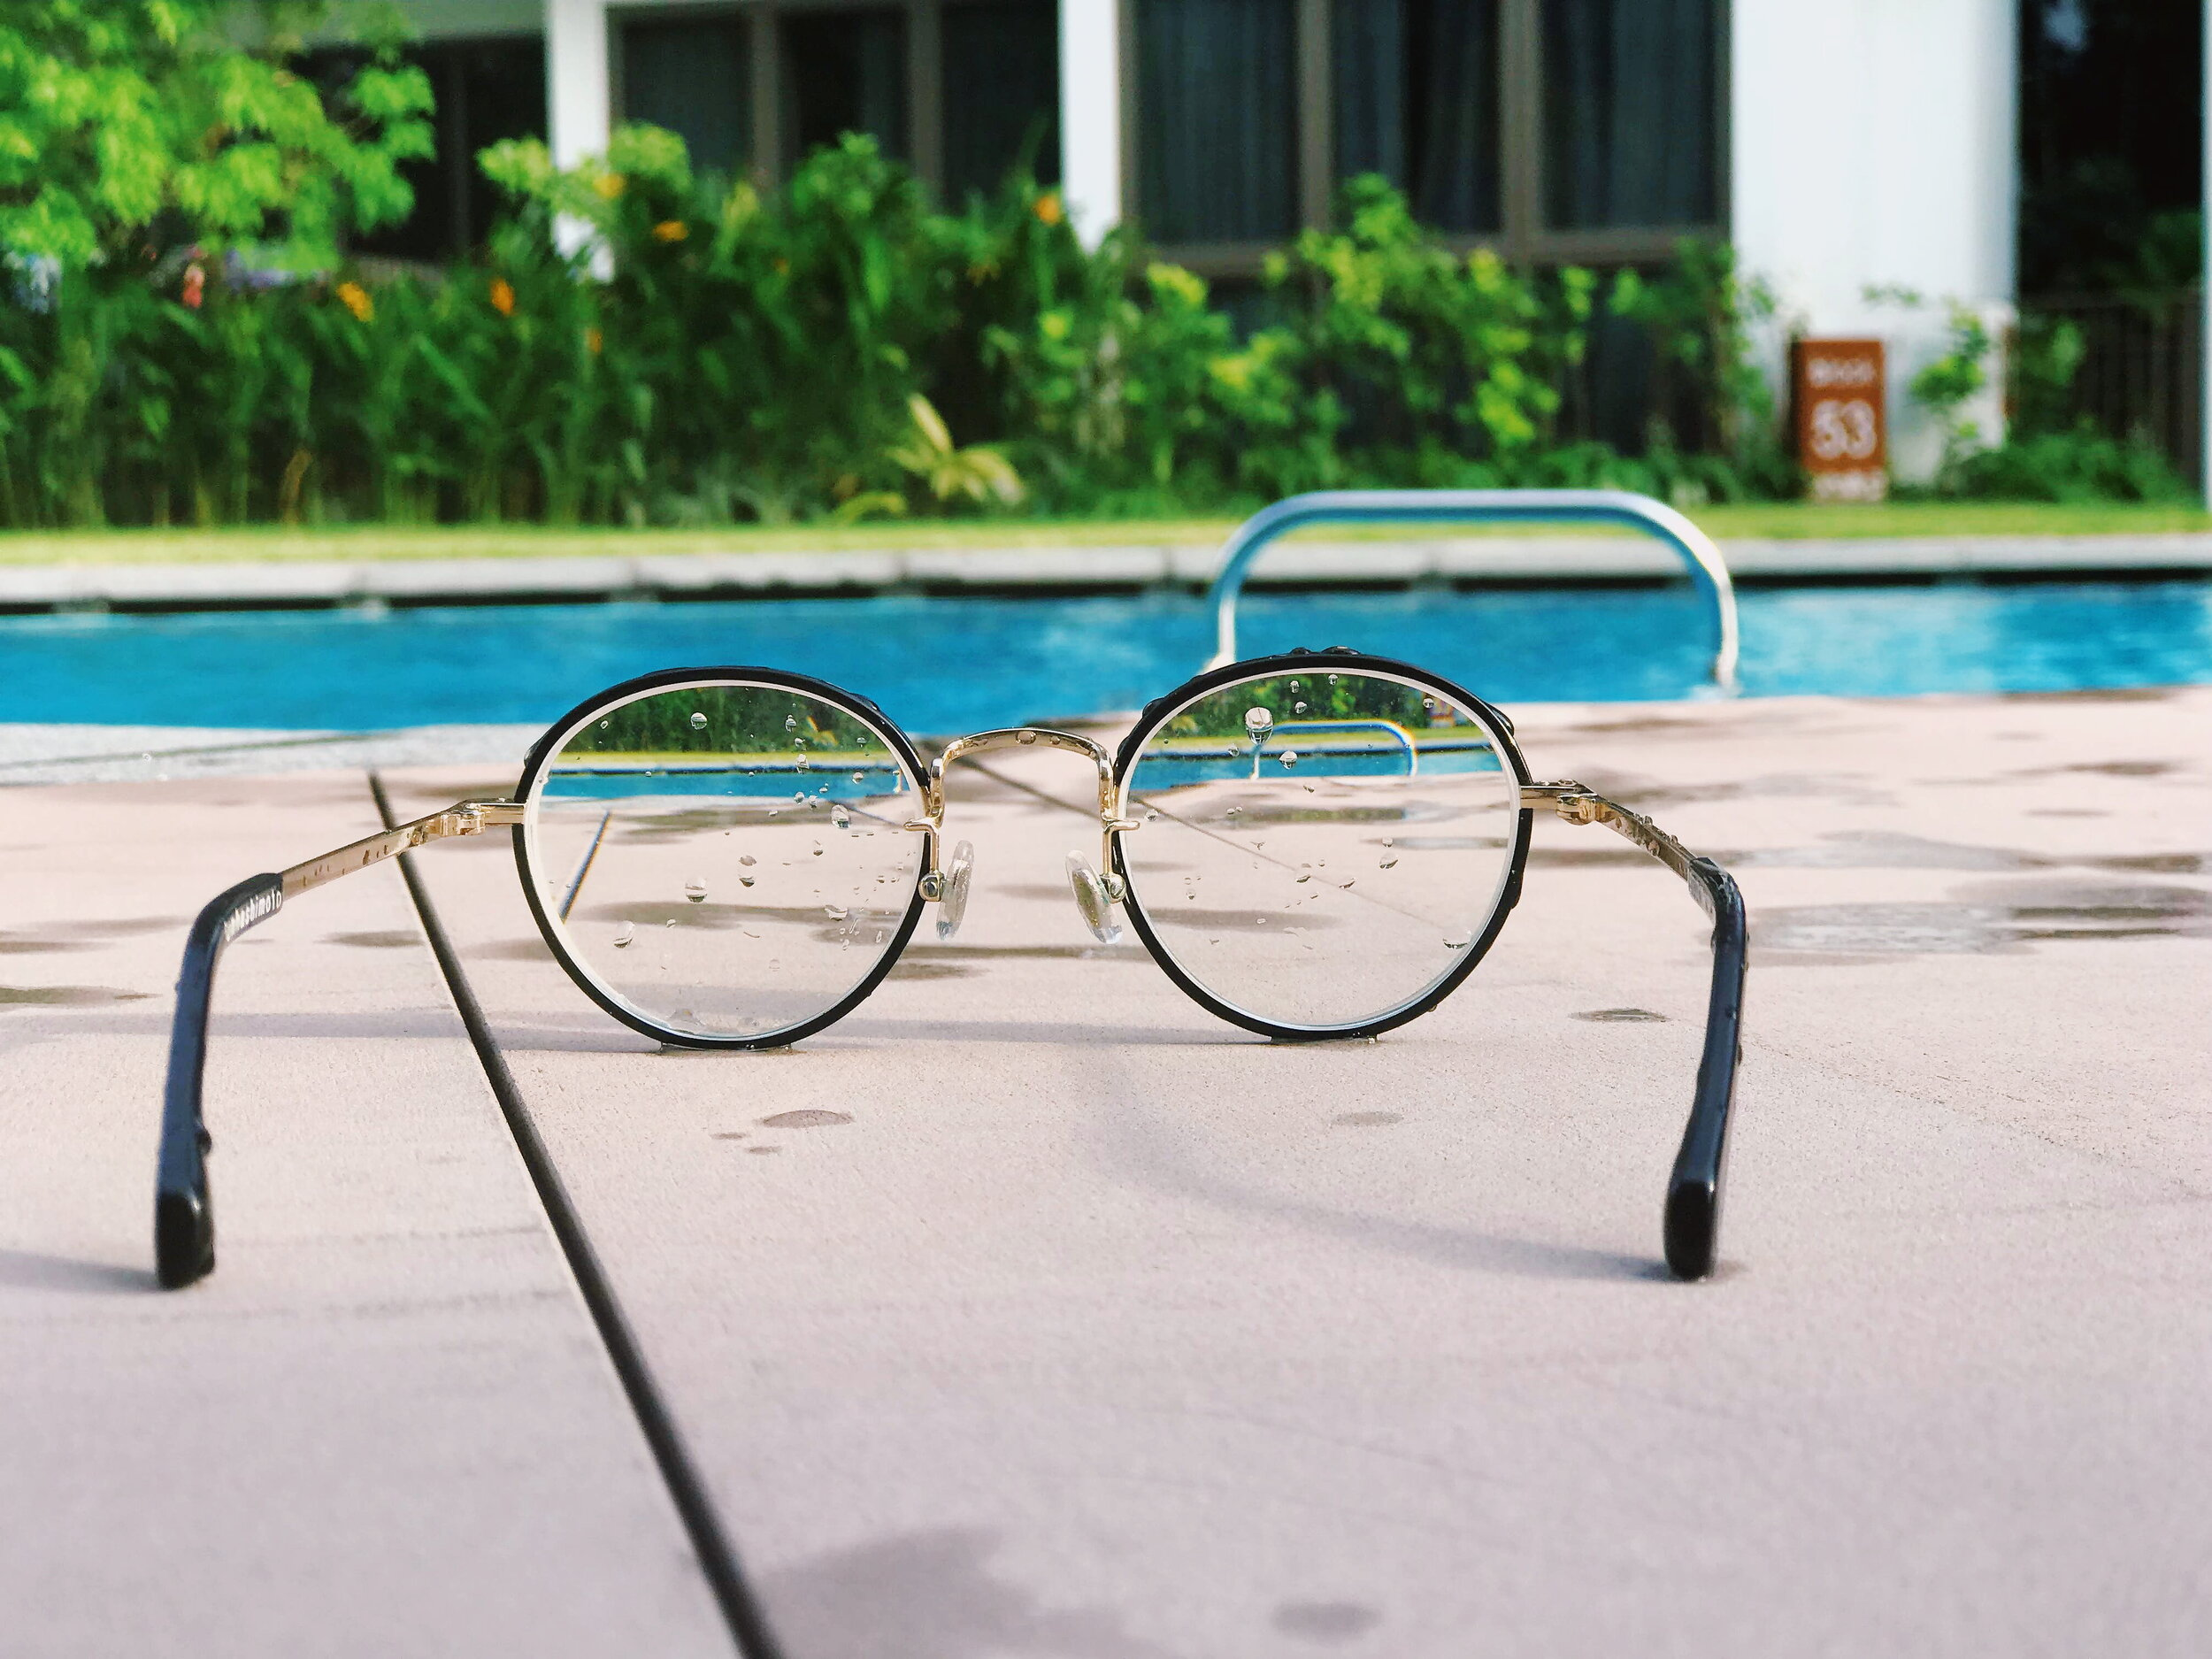 The glasses of perception